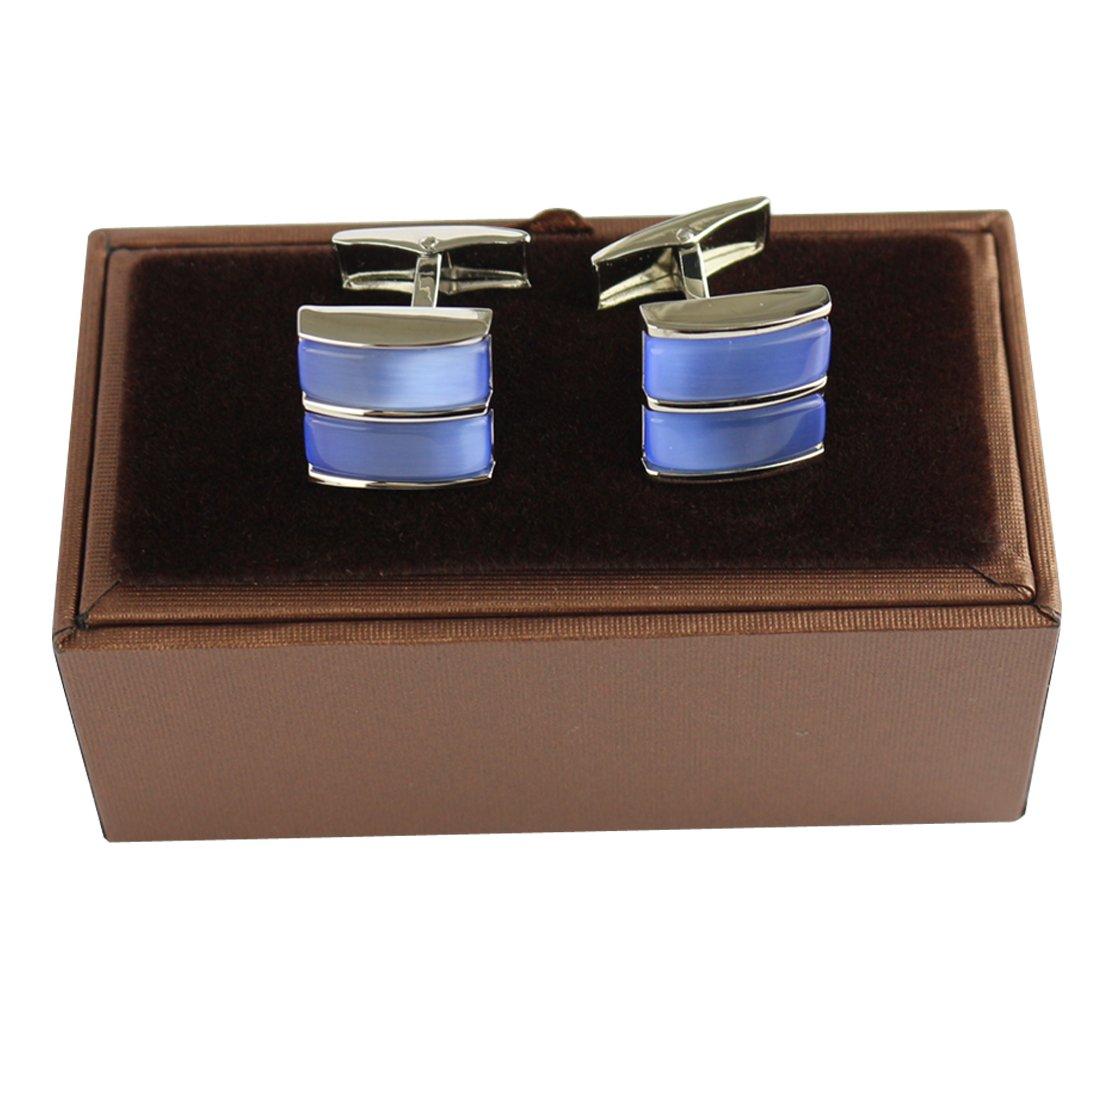 PINMEI 2 PCS Cufflinks Men Women Shirt Business Weeding Christmas Halloween Jewelry Set 1) RC05